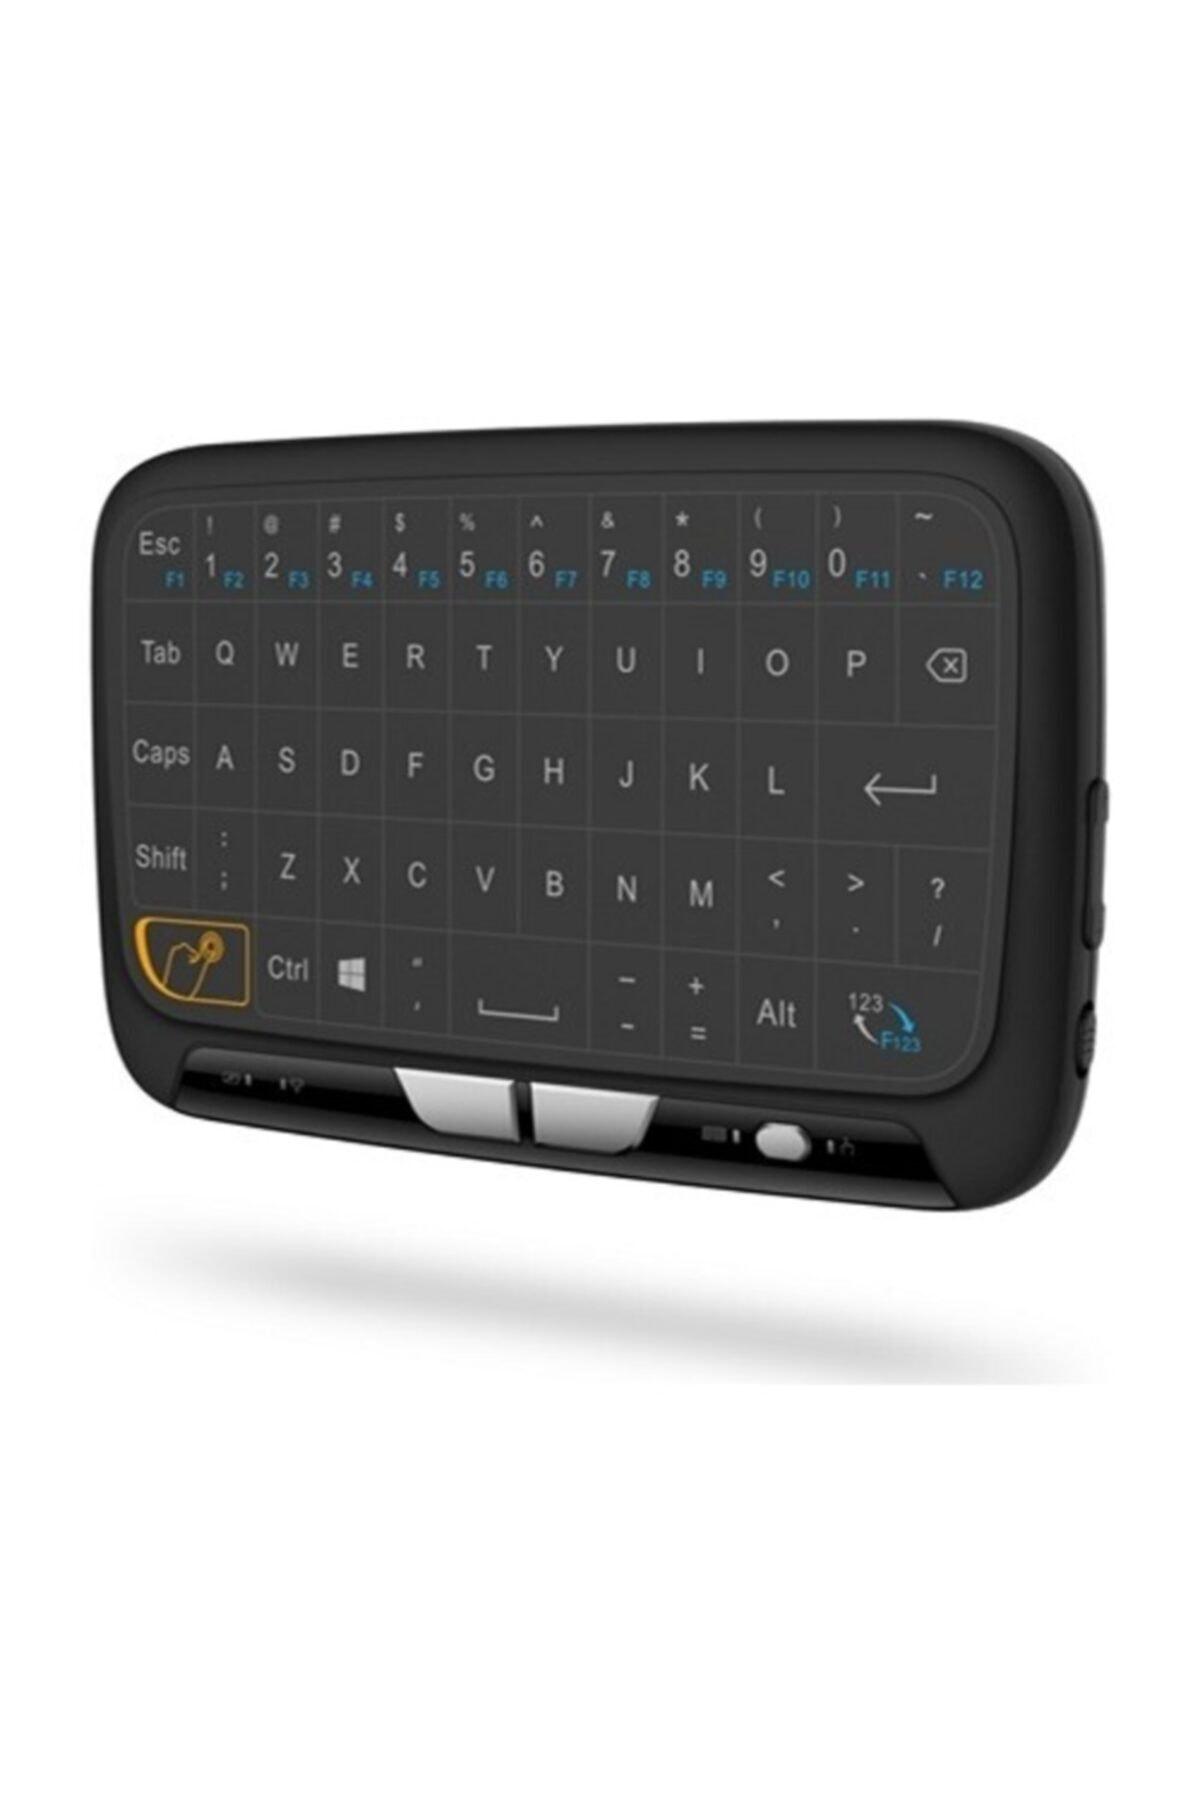 Paleon H18 Kablosuz Mini Klavye Touchpad Şarjlı Smart Tv Dokunmatik Mouse 1